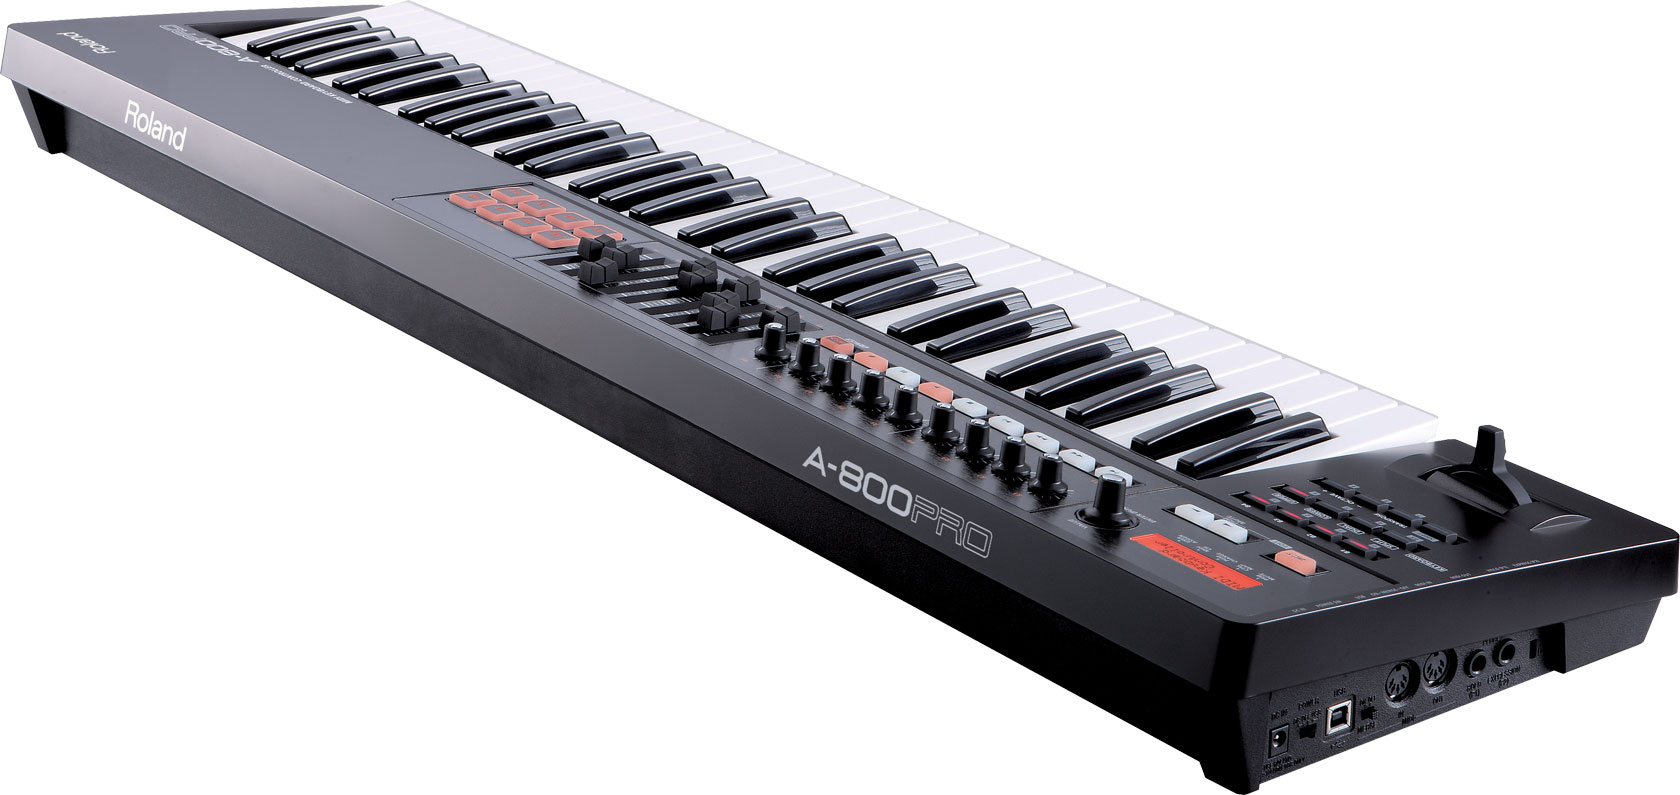 Roland A 800pro Midi Keyboard Controller Wiring Diagram